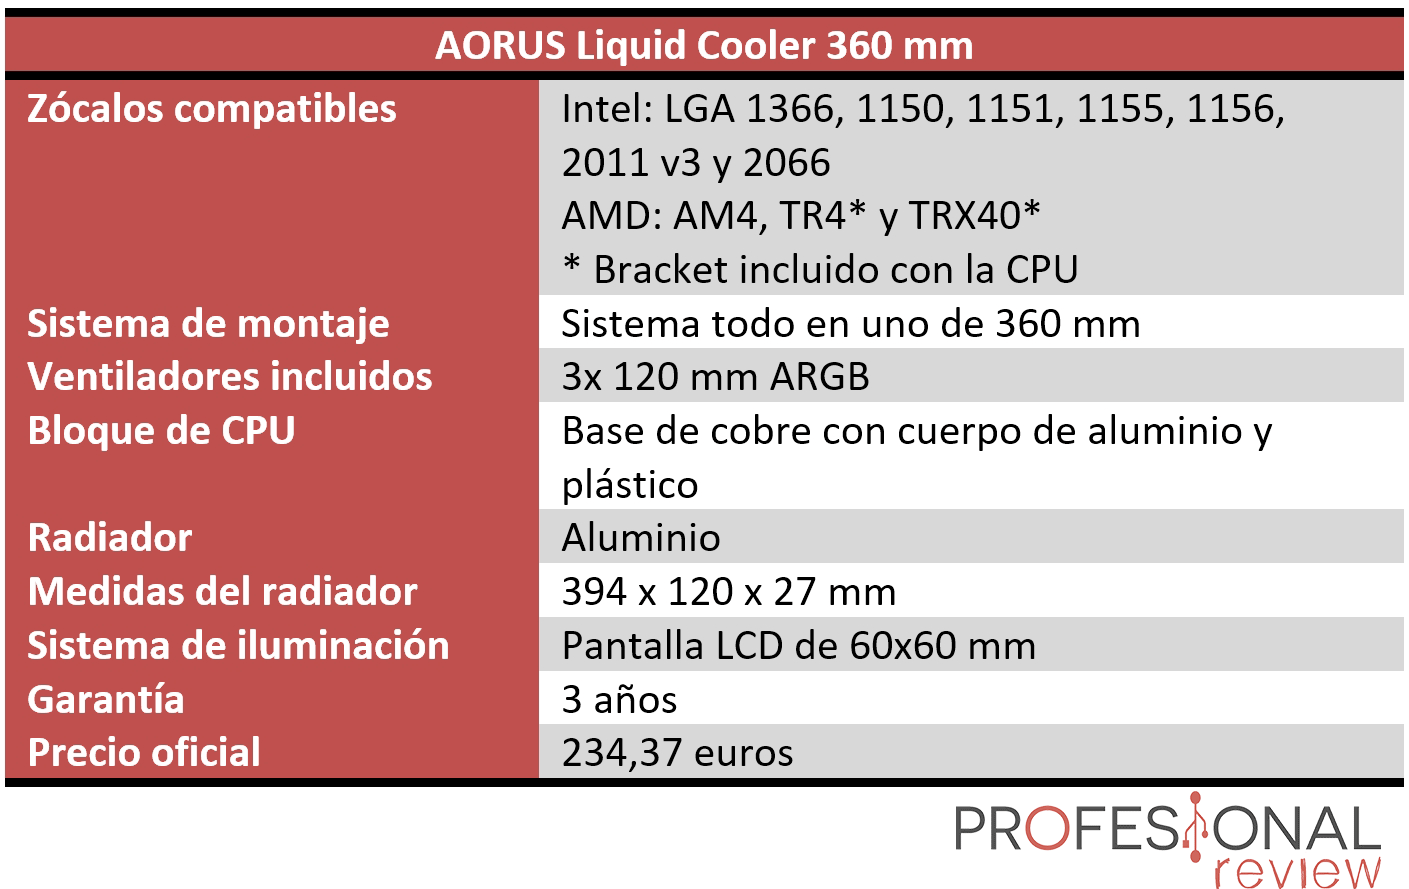 AORUS Liquid Cooler 360 Características